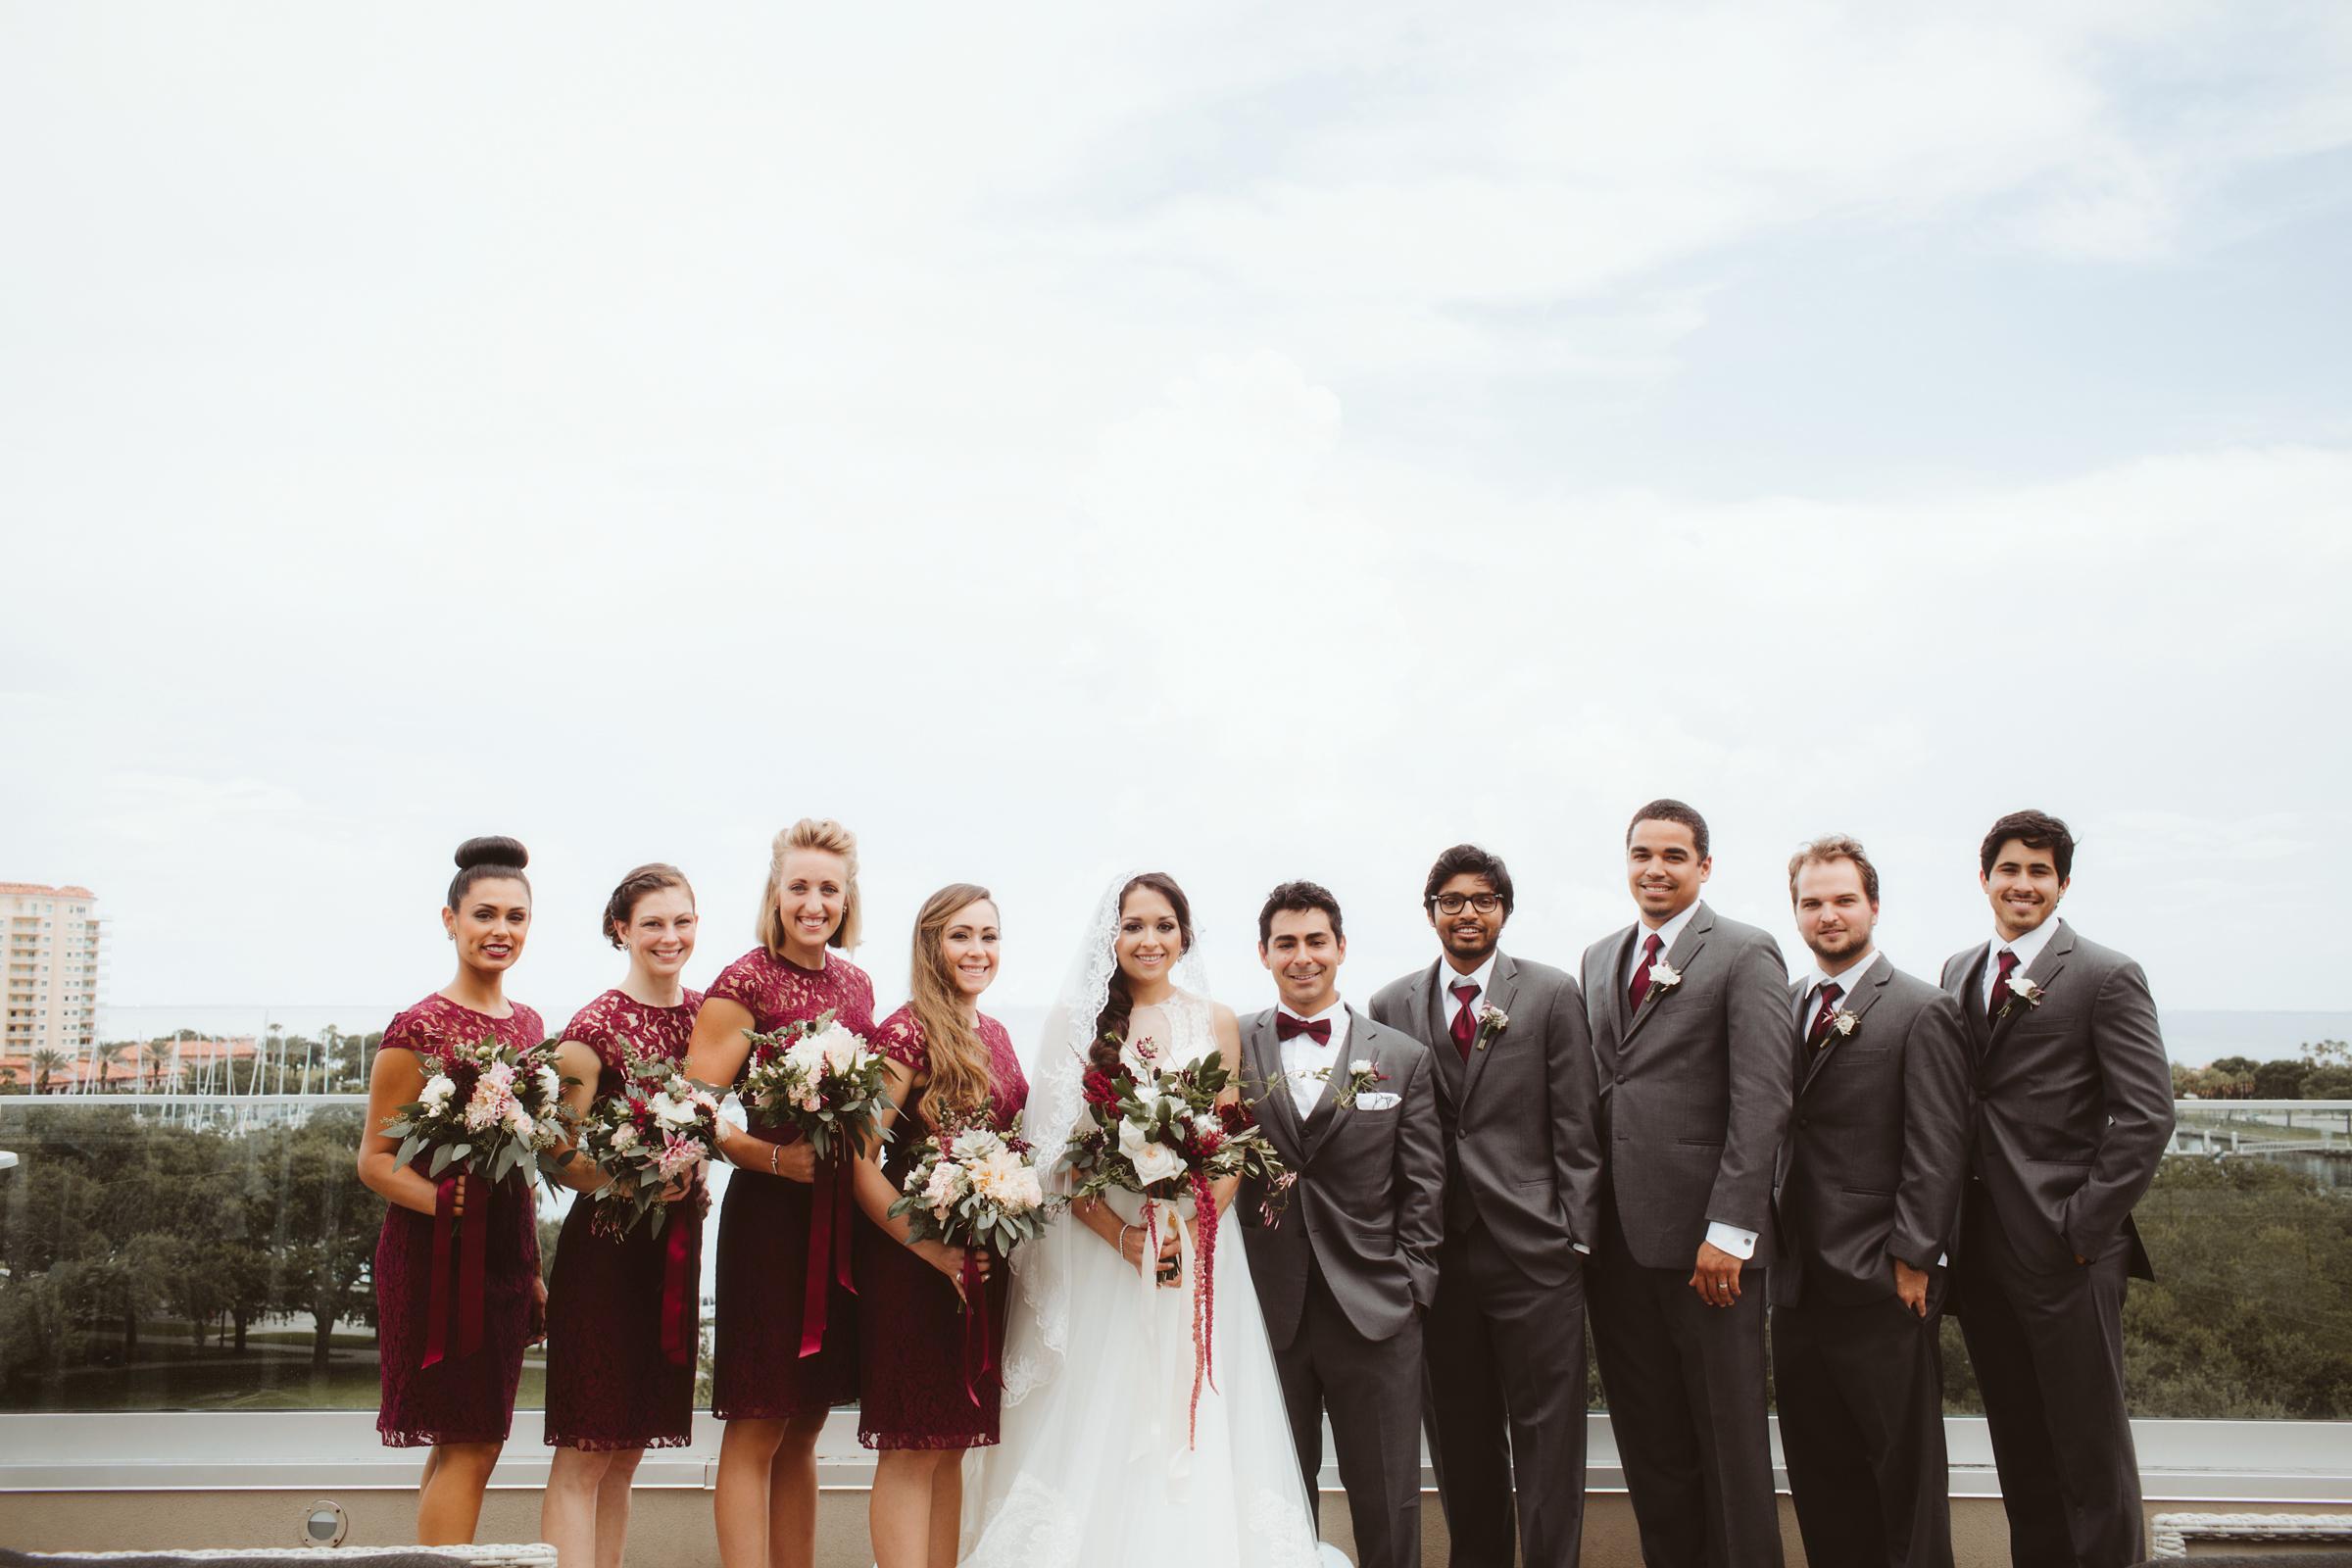 wedding day | MFA St Pete | Vanessa Boy Photography | vanessaboy.com-169.com |final.jpg